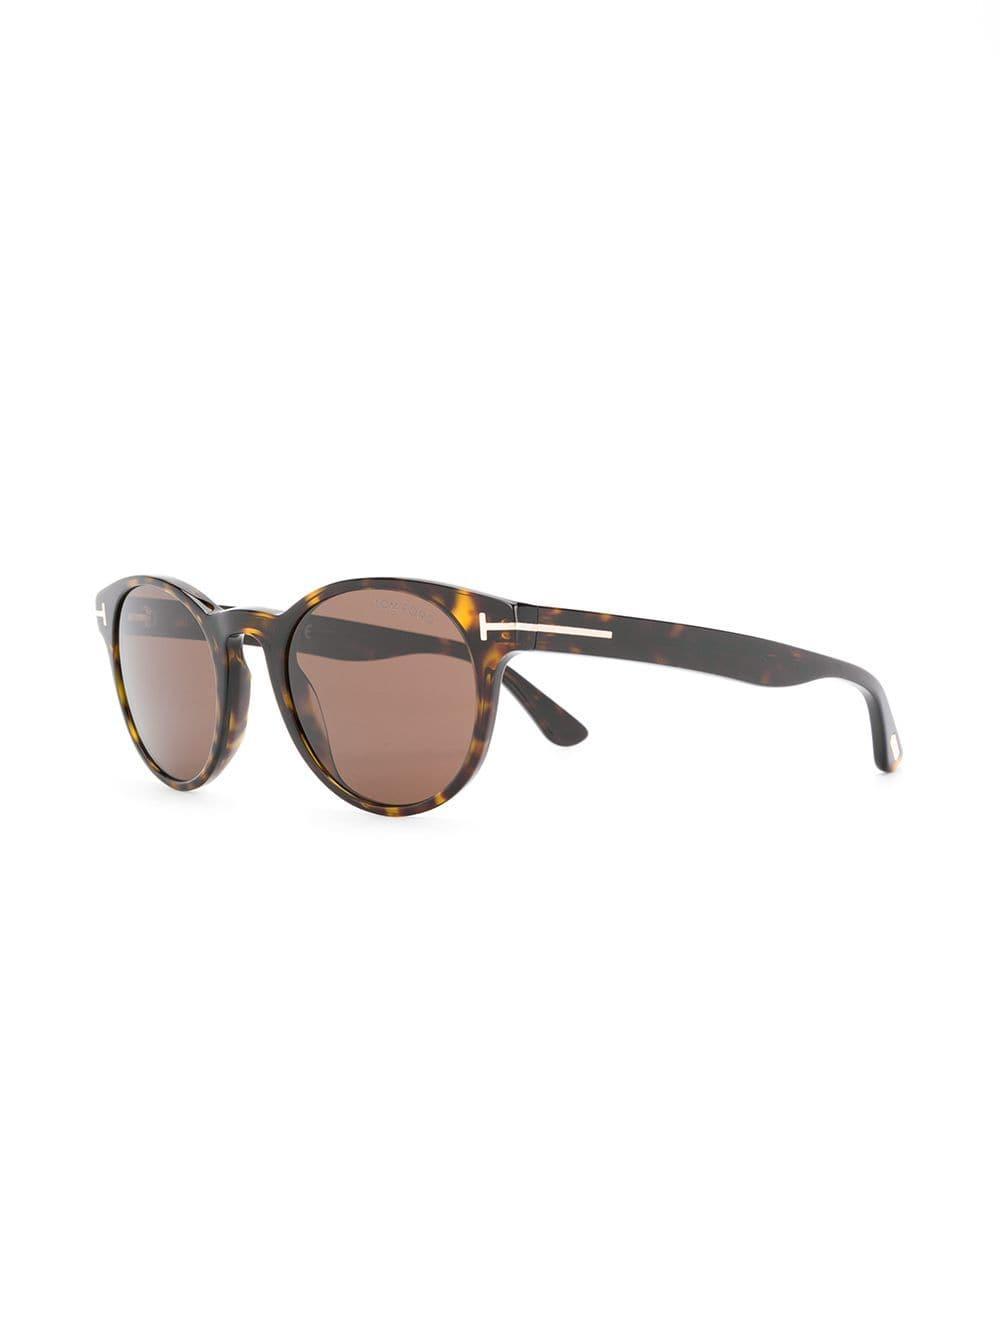 0945c079e34 Tom Ford - Brown Round Frame Glasses - Lyst. View fullscreen